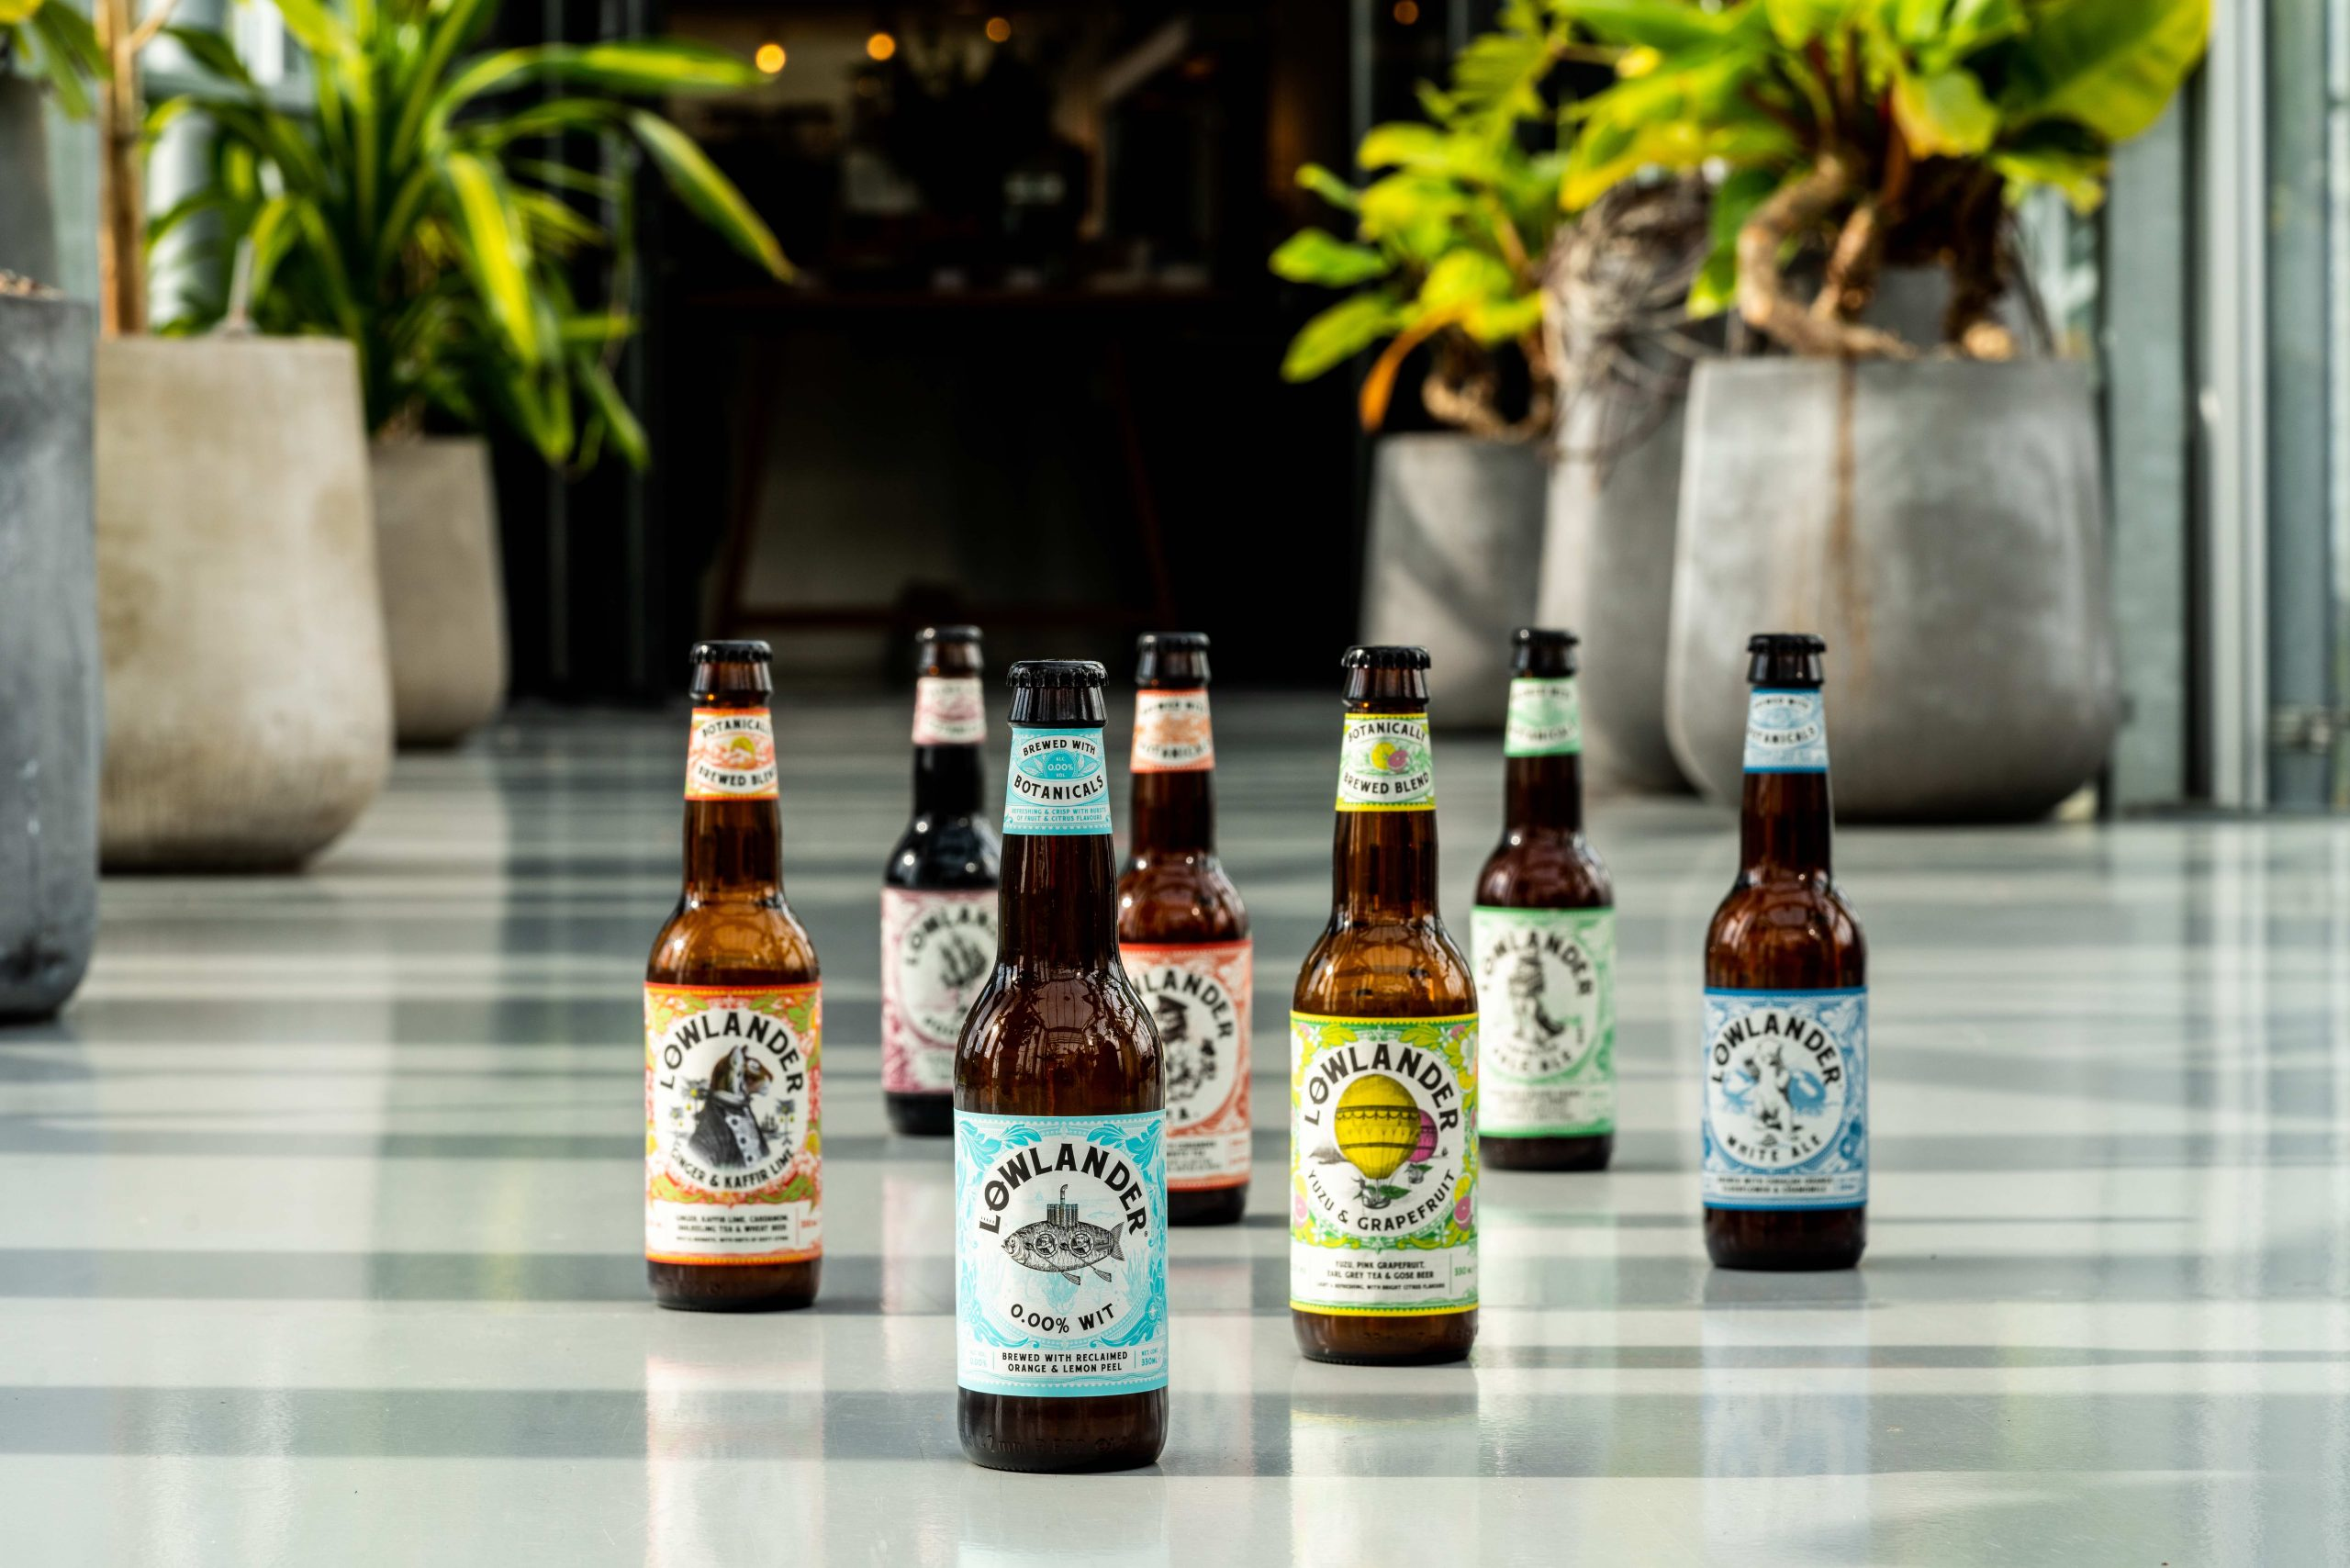 Lowlander Botanical Beer Announces Westons Cider Distribution Partnership In Uk photo